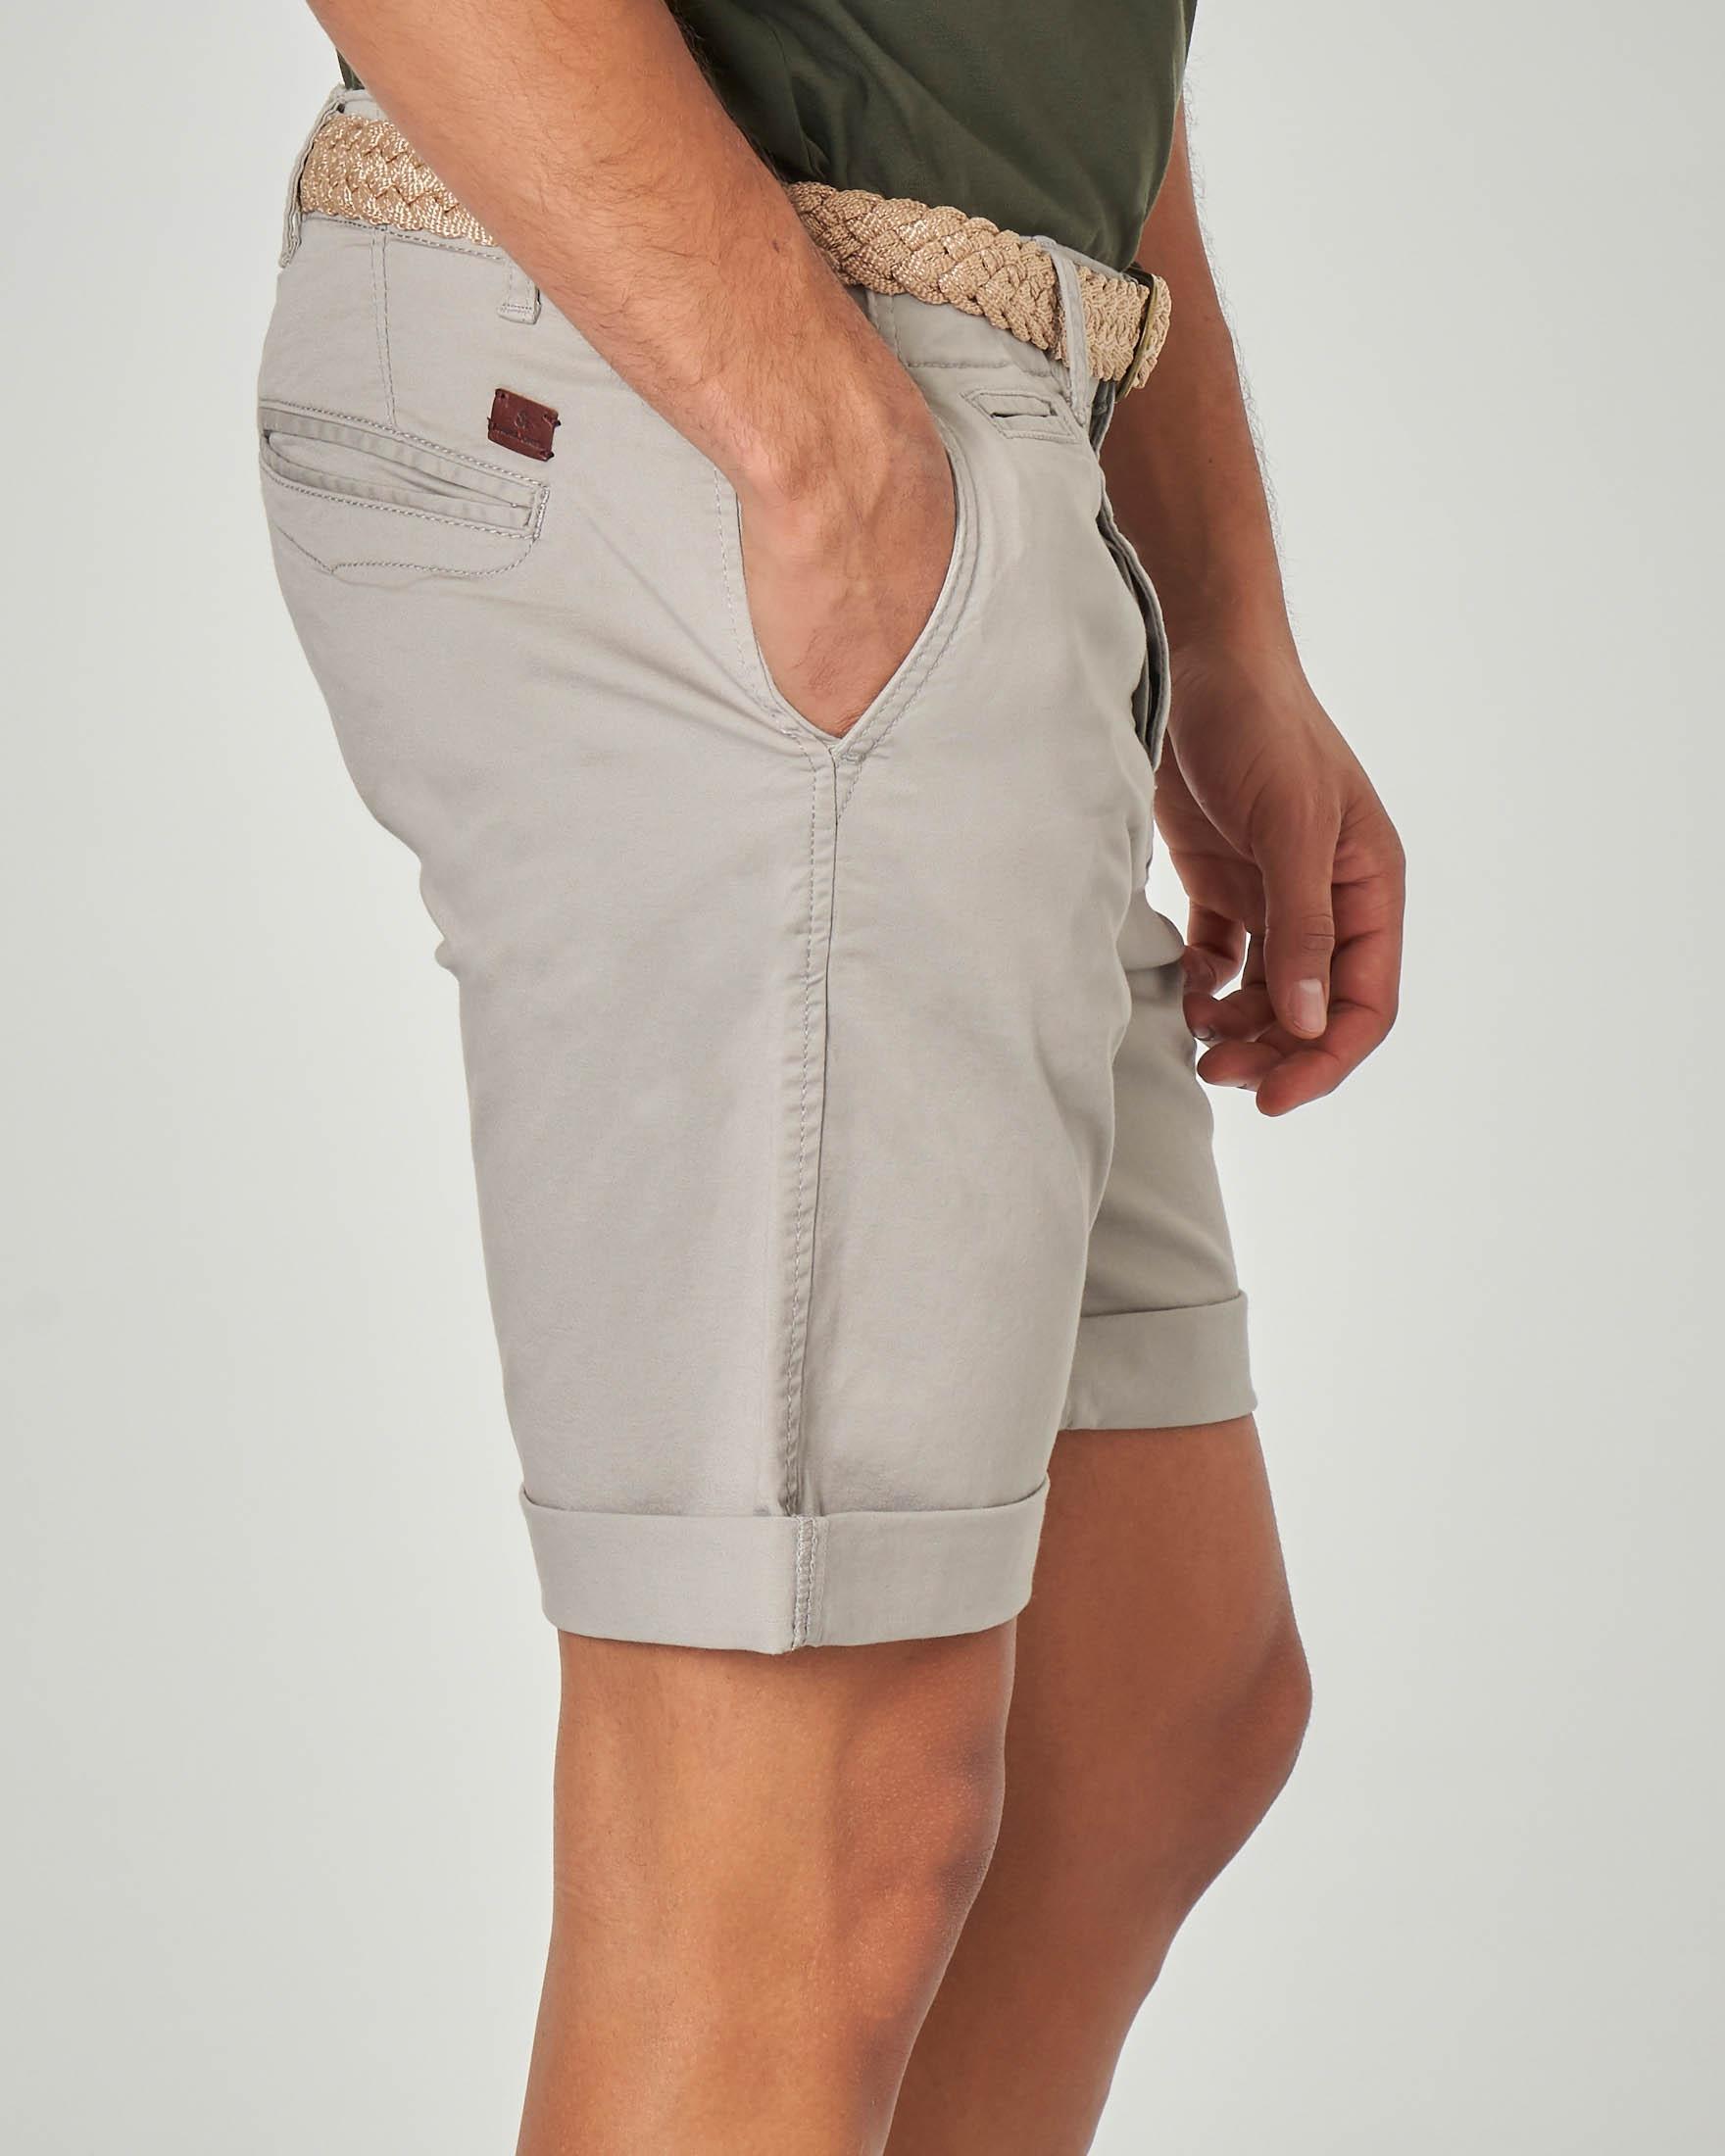 Bermuda chino grigio con cintura in corda intrecciata